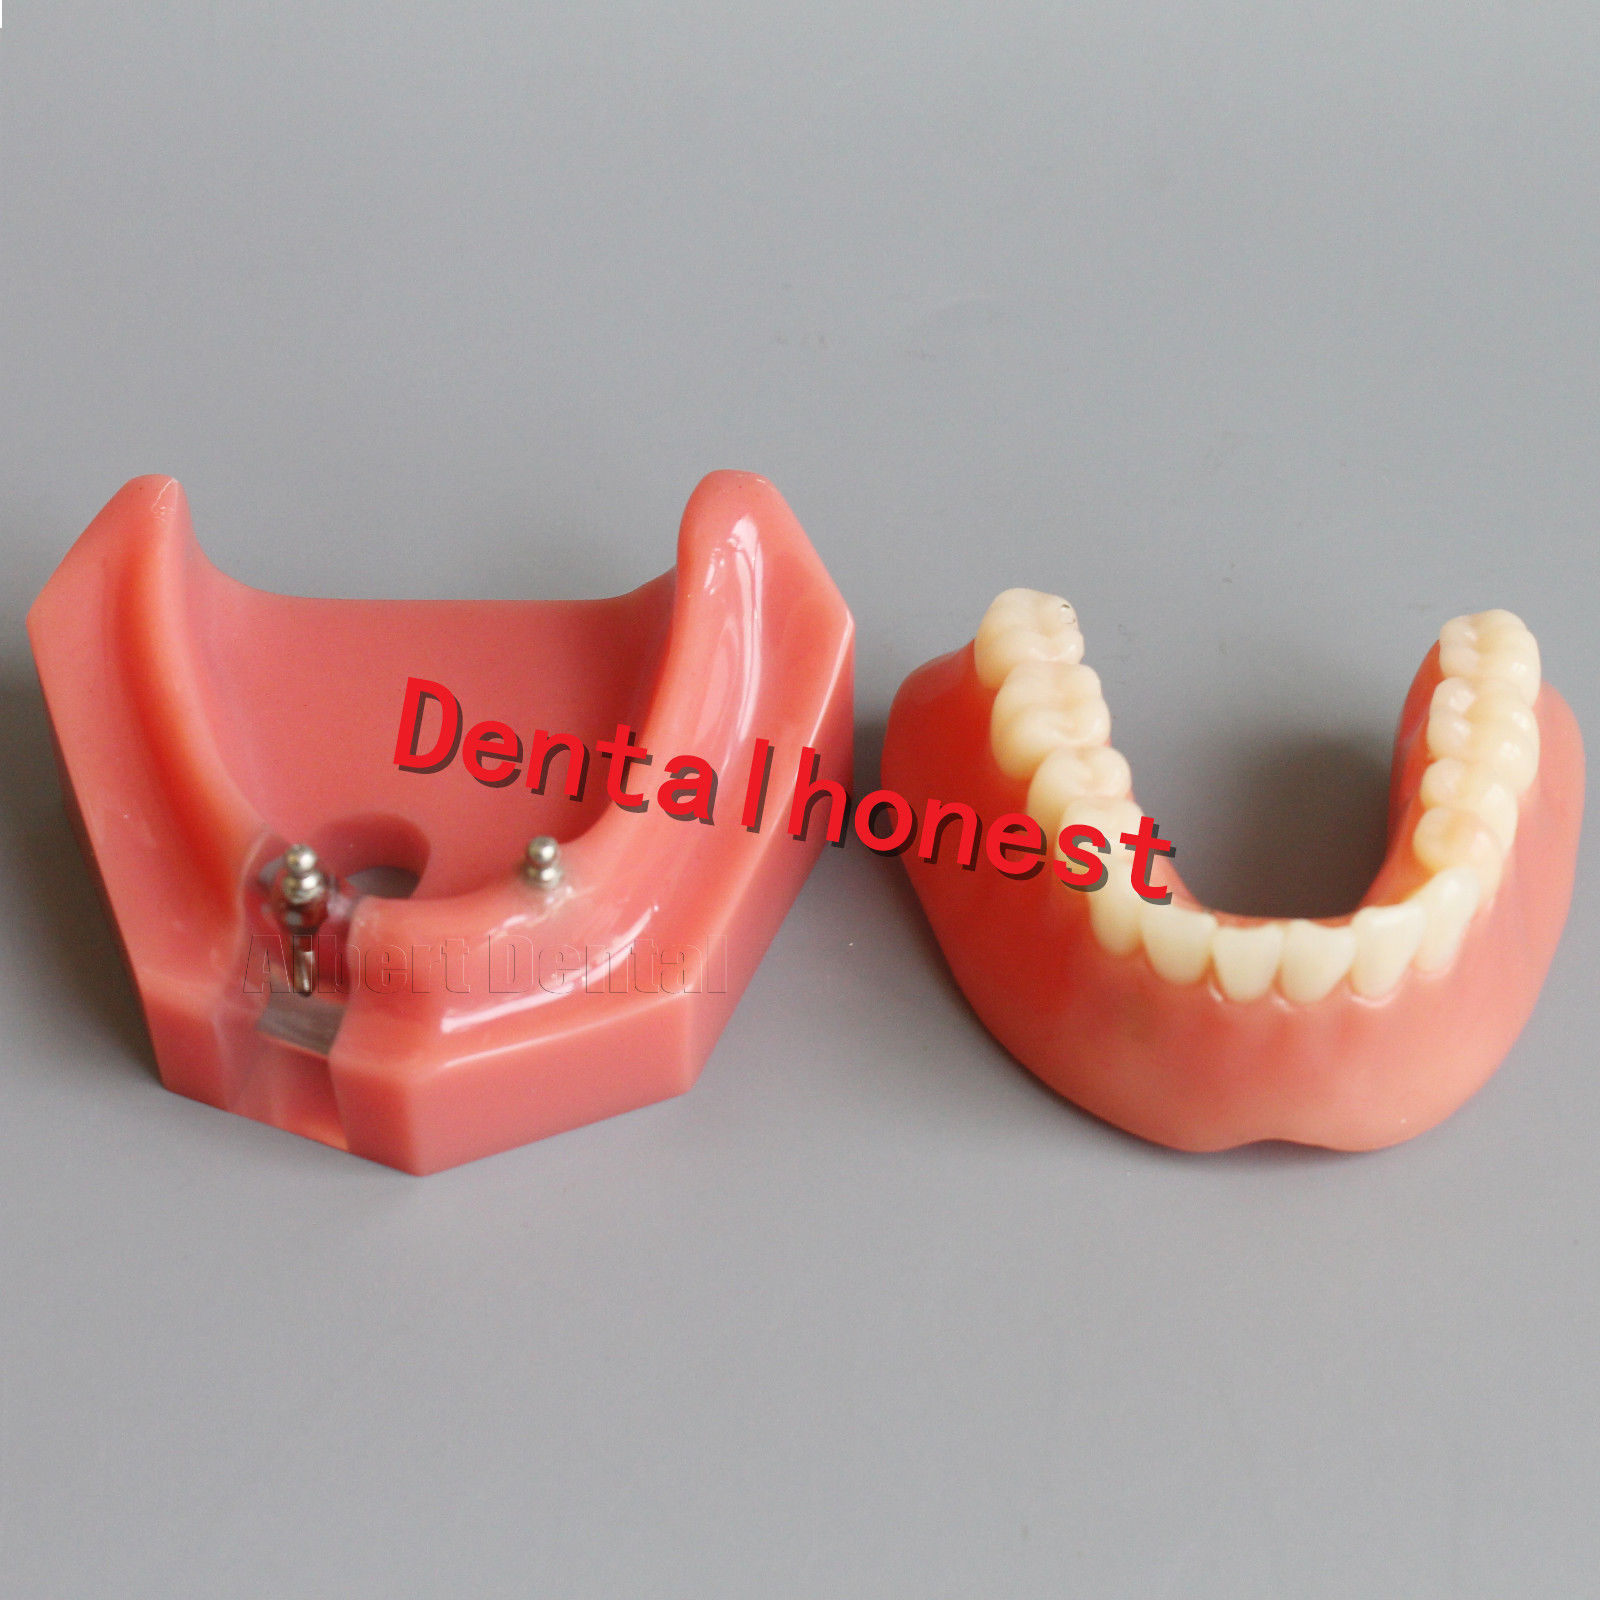 Dental Inferior Implant Overdenture 6007 Teeth Model 2 Implants Tooth Model